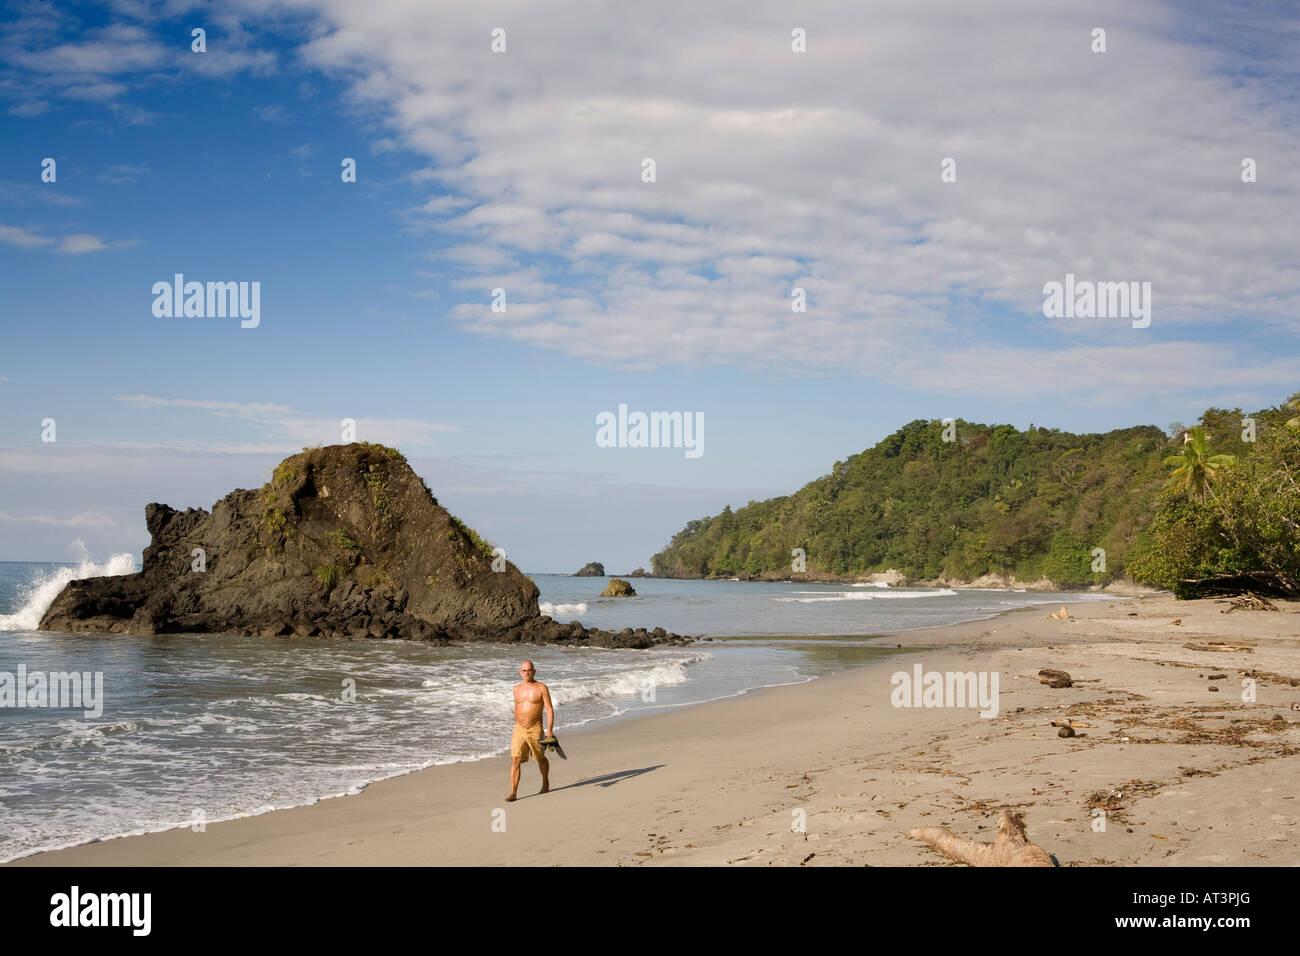 Costa Rica Quepos Playa Espadilla Norte Beach American Expat Resident Taking Early Morning Walk